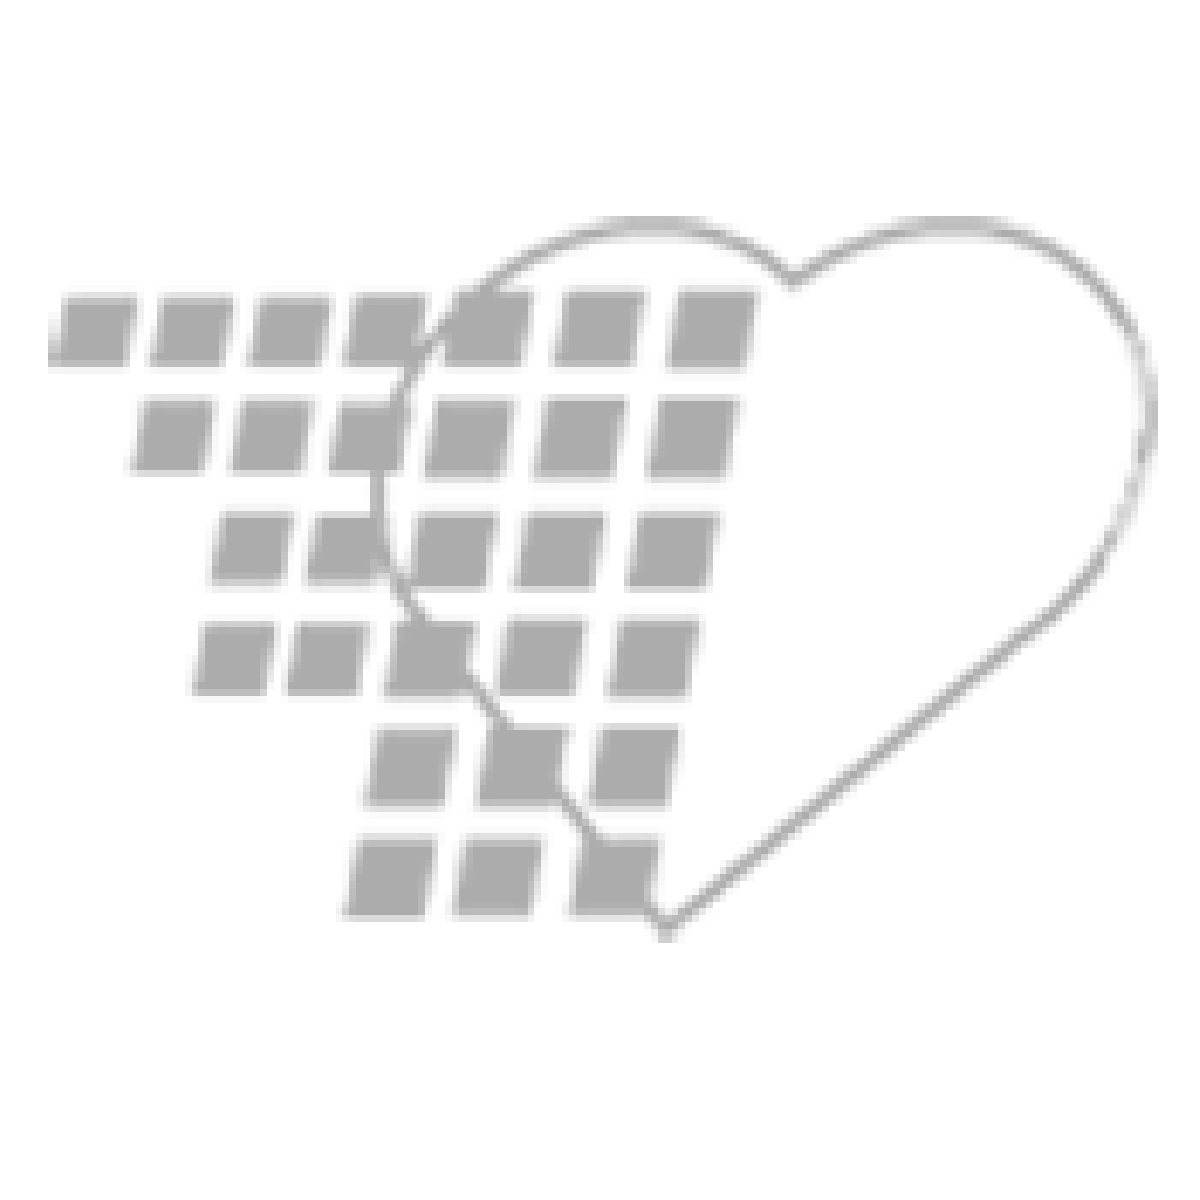 07-71-0006 - Shiley Tracheostomy Tube #6 - Cuffless with Inner Cannula